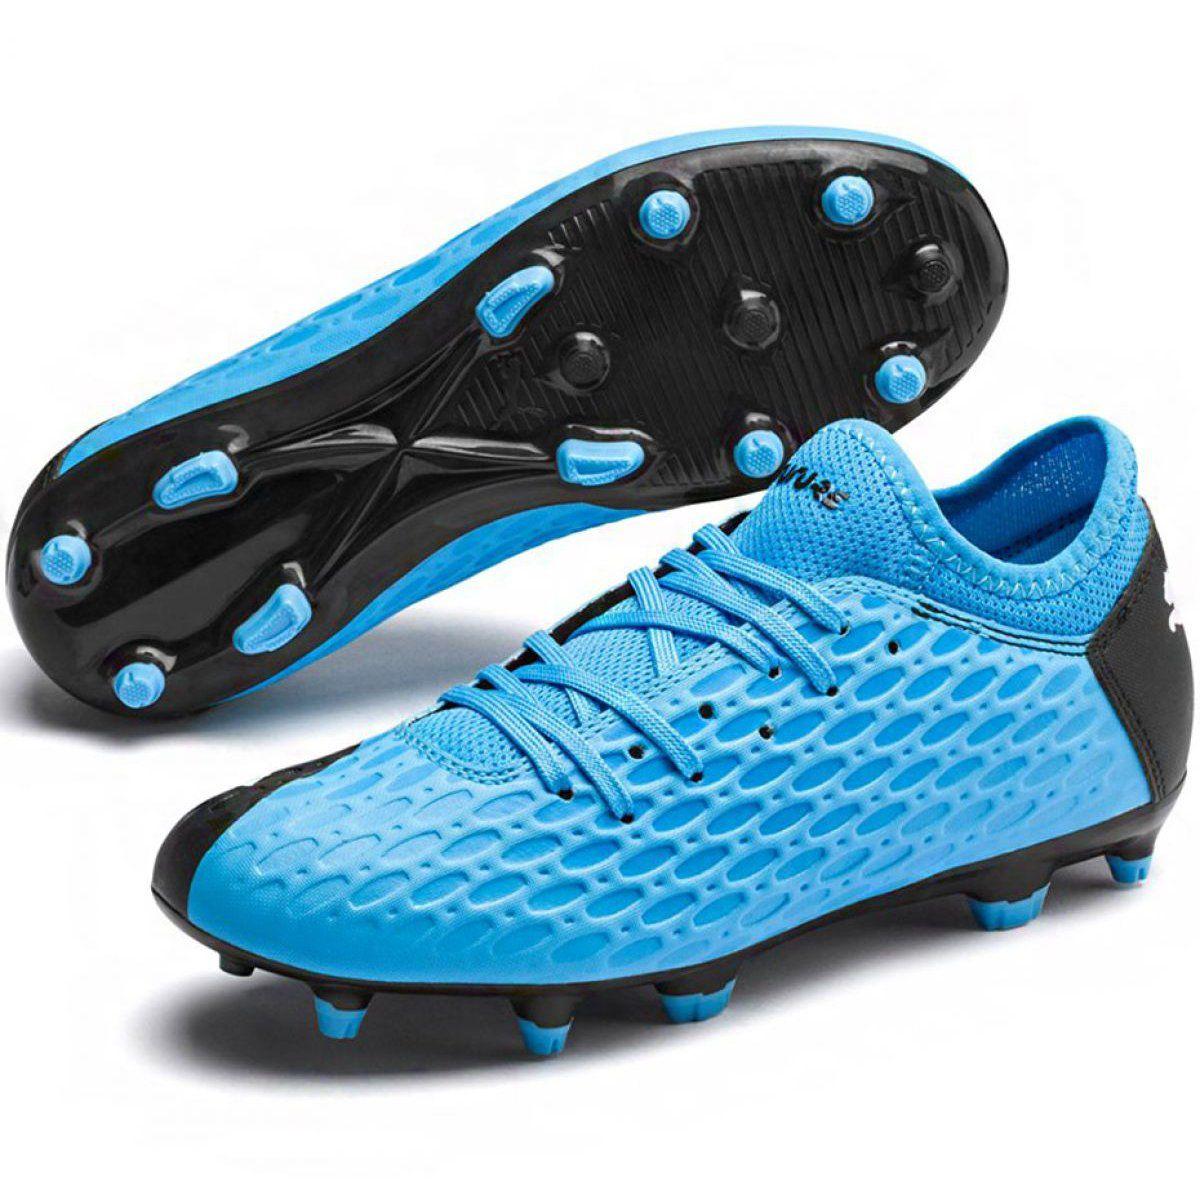 Buty Pilkarskie Puma Future 5 4 Fg Ag Jr 105810 01 Niebieskie Granatowe Football Boots Football Shoes Youth Football